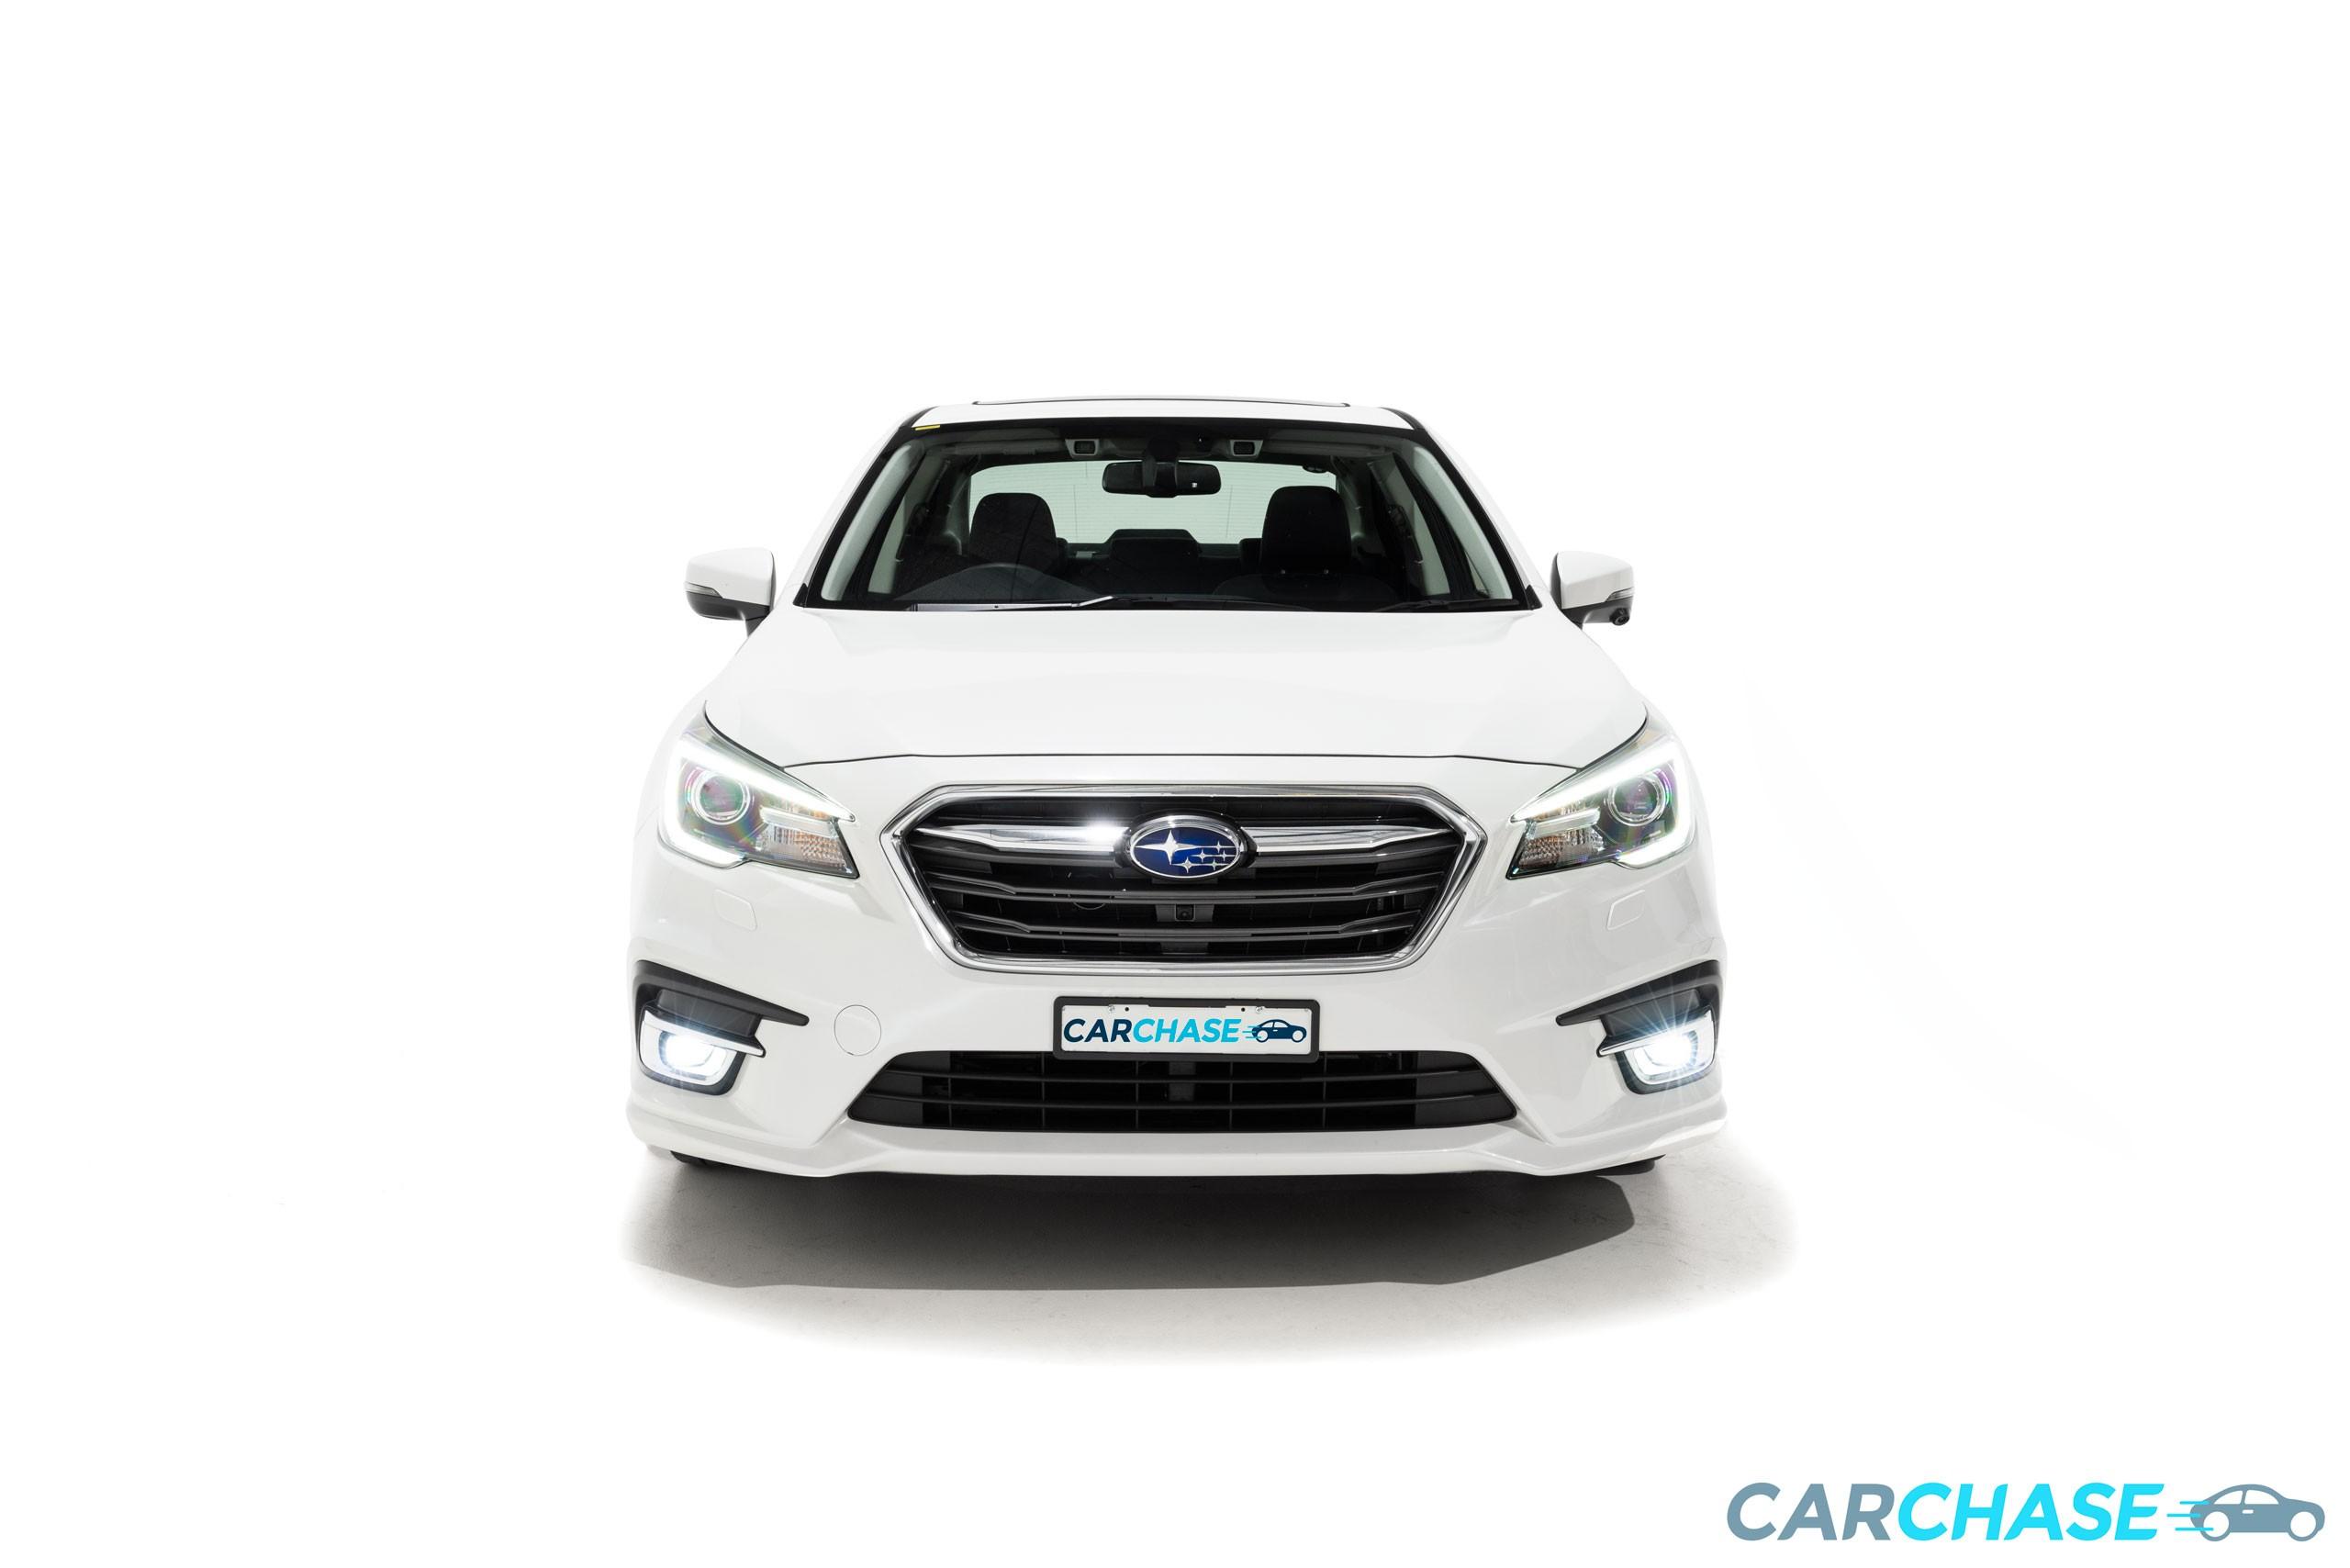 Image of front profile of 2018 Subaru Liberty 2.5i Premium